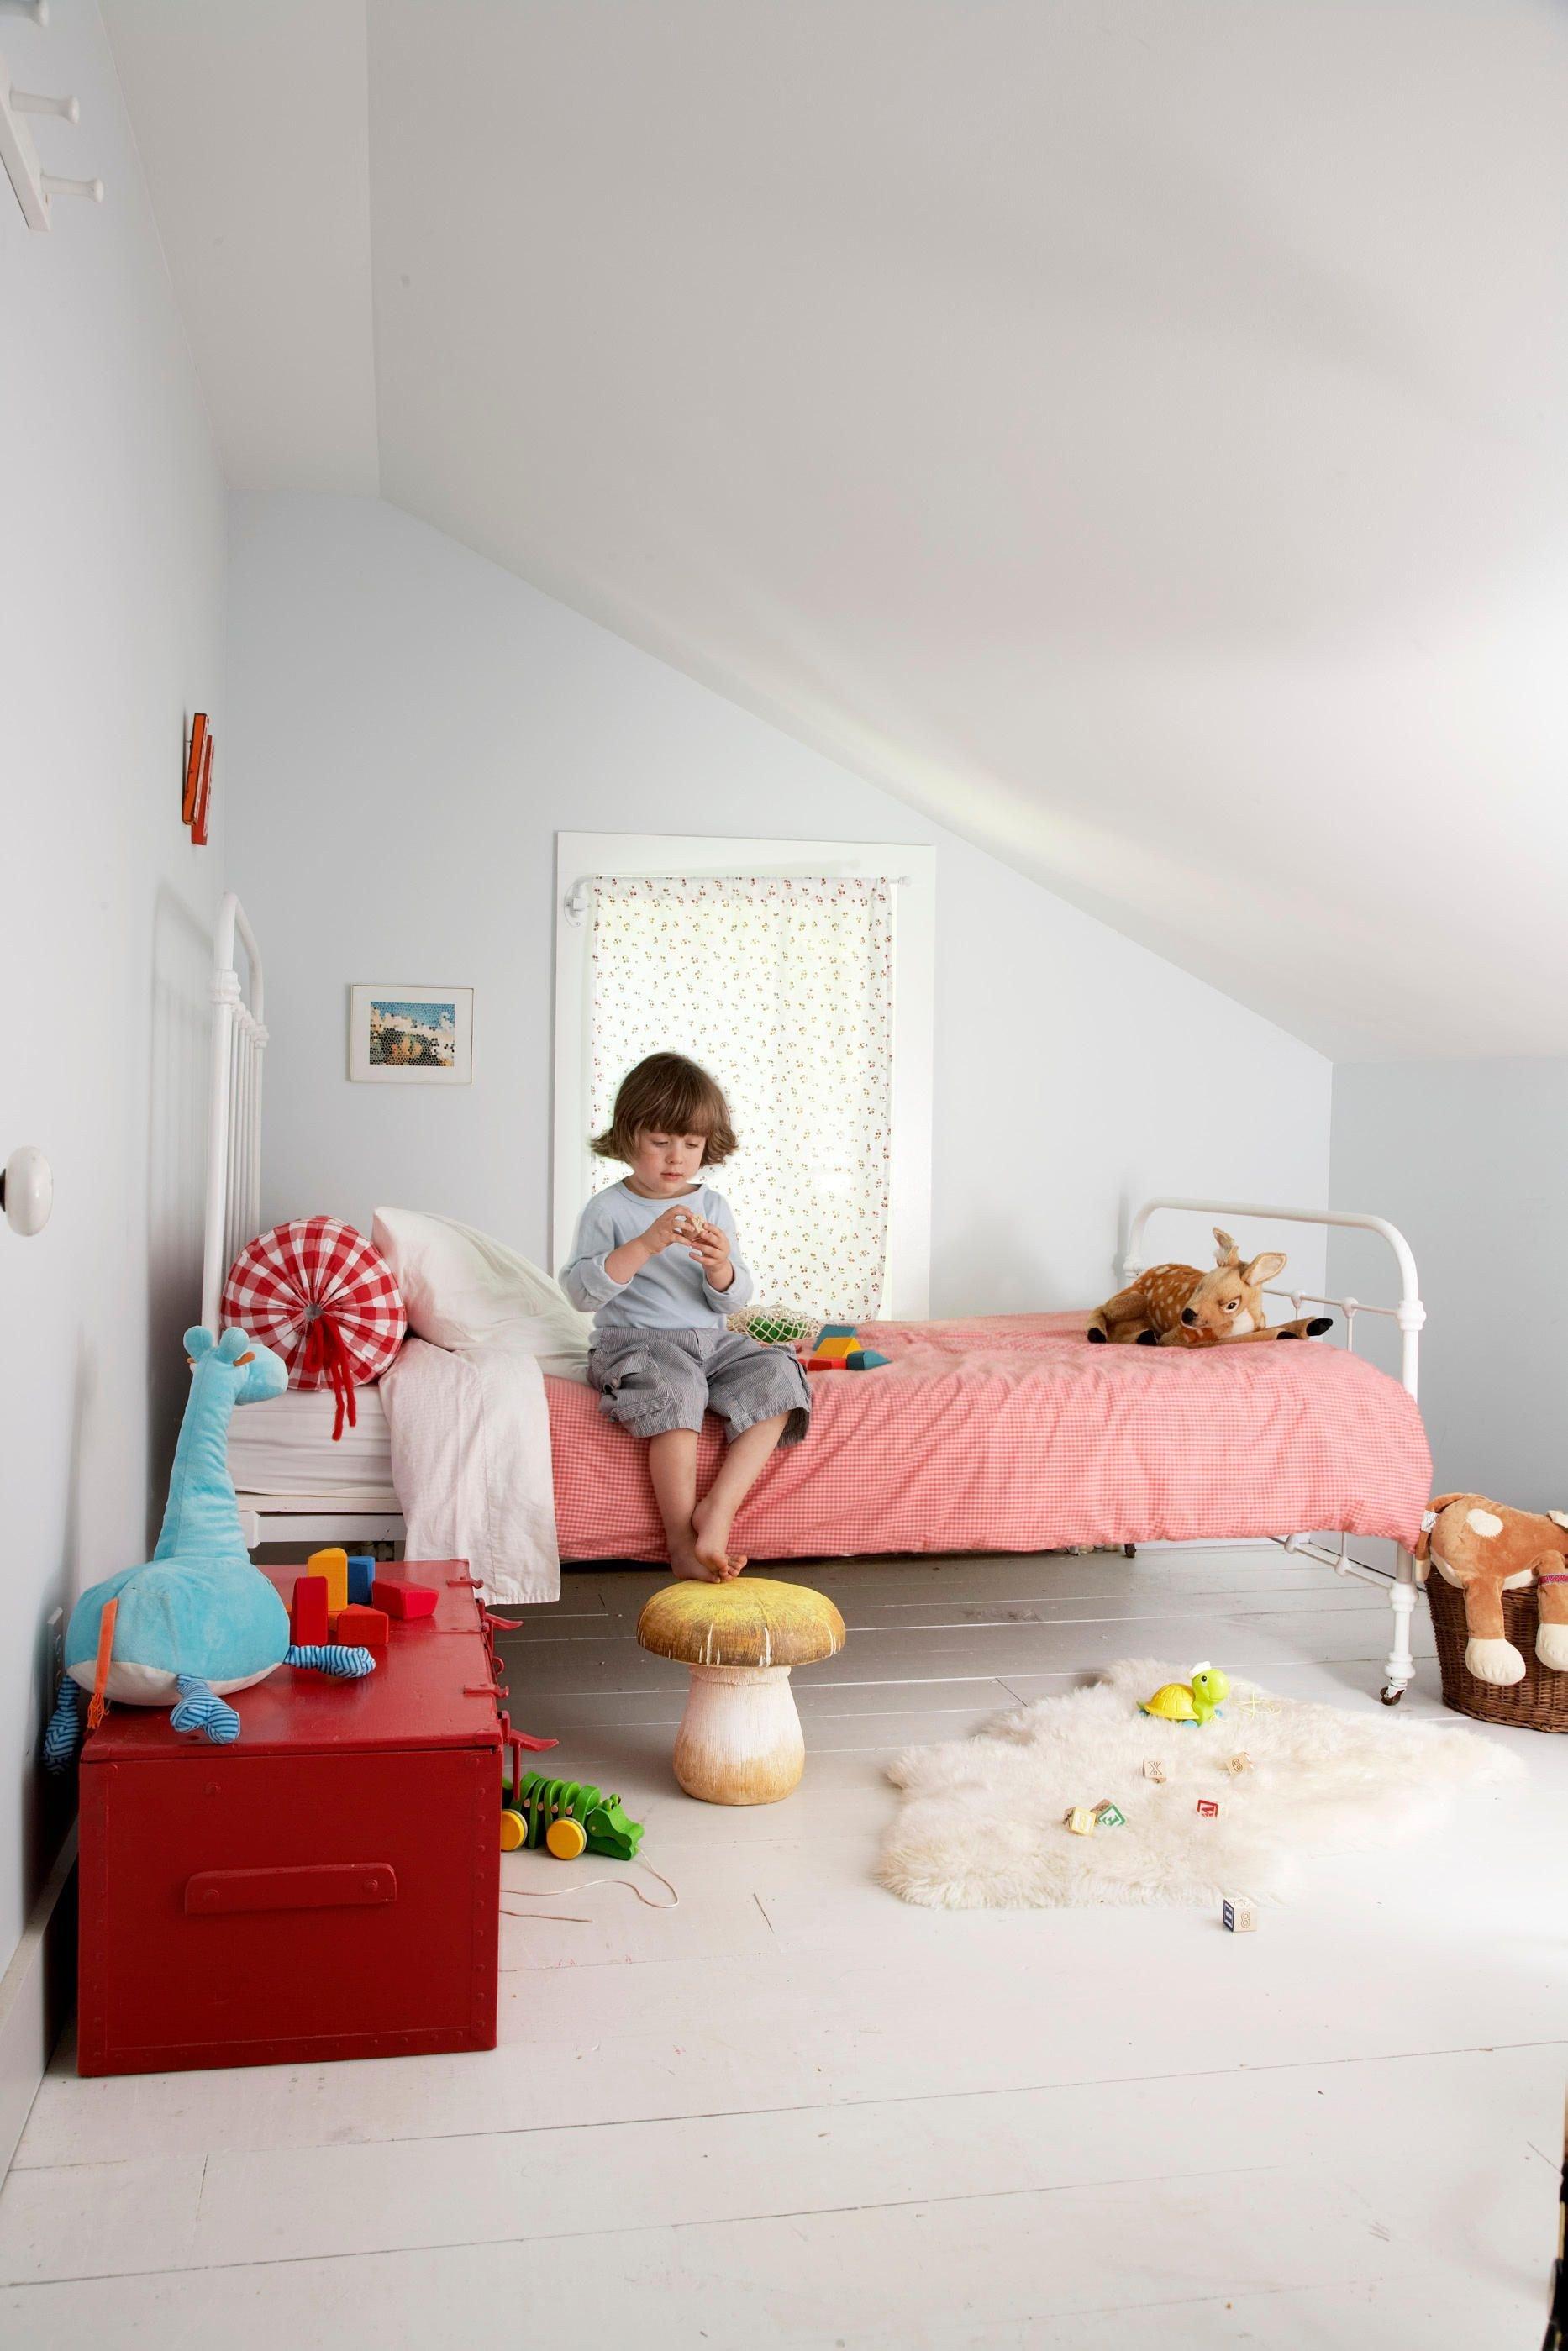 Toddler Bedroom Furniture Set New 30 Best Kids Room Ideas Diy Boys and Girls Bedroom